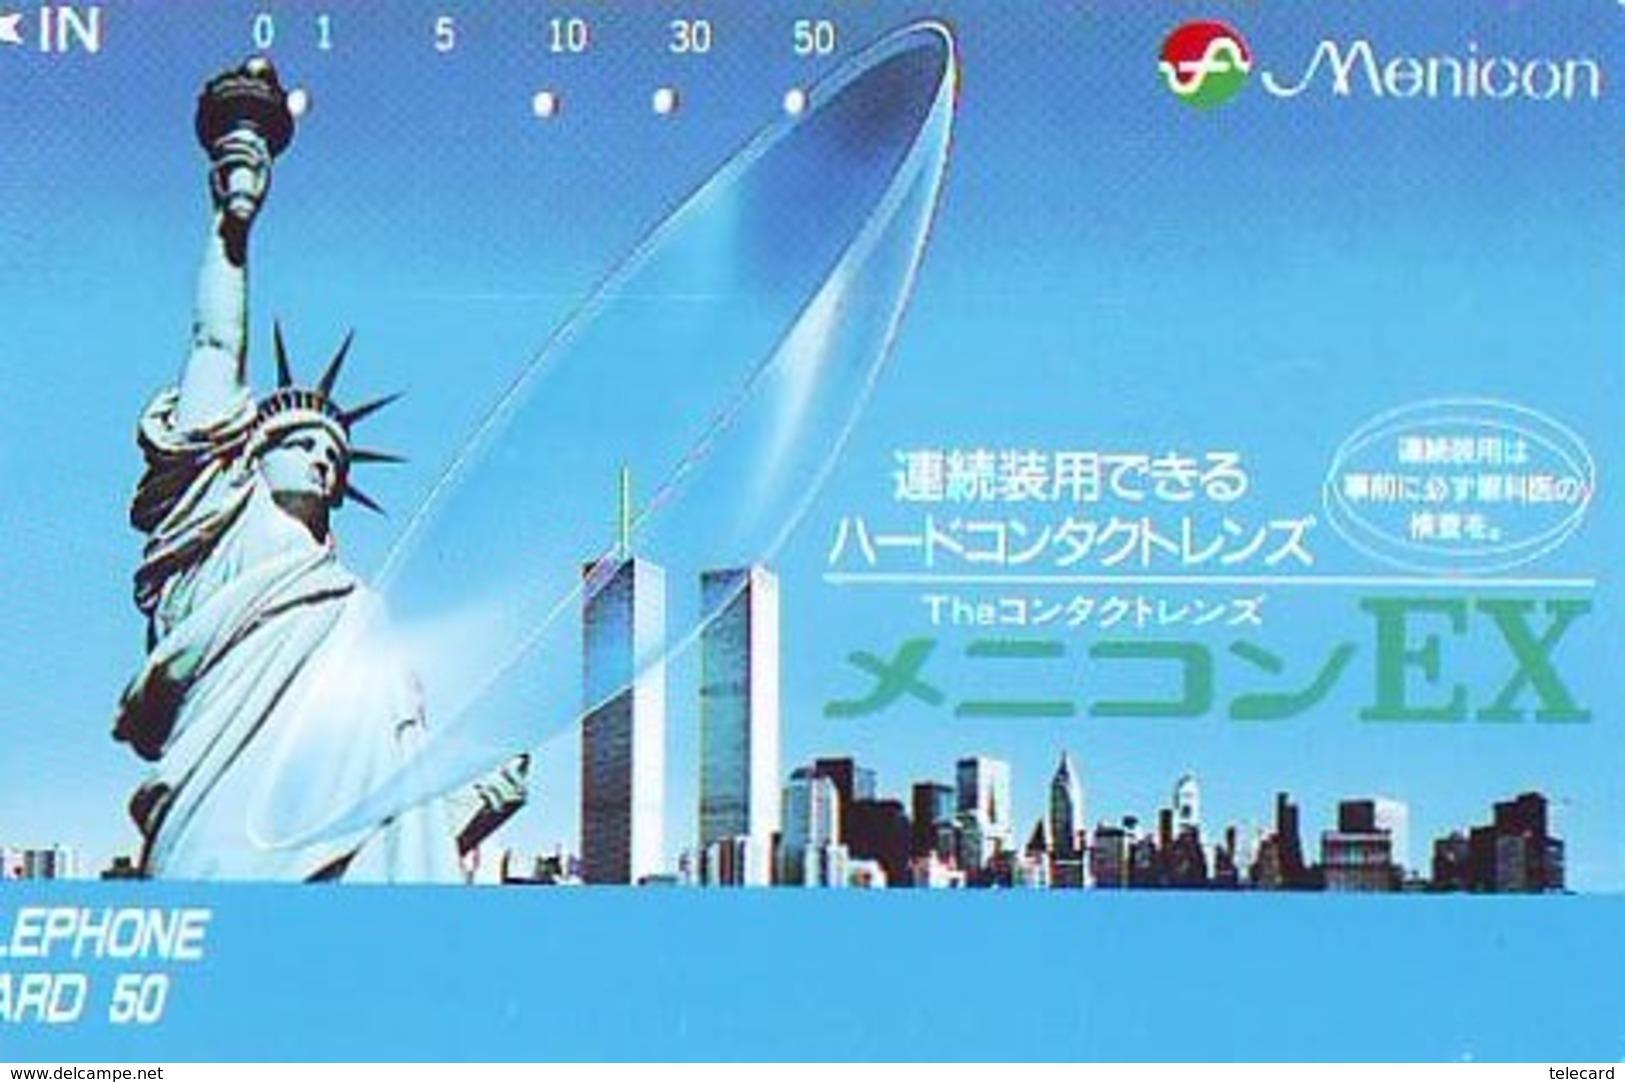 Télécarte JAPON (927) Statue De La Liberte * New York USA * PHONECARD JAPAN * STATUE OF LIBERTY * - Landschappen